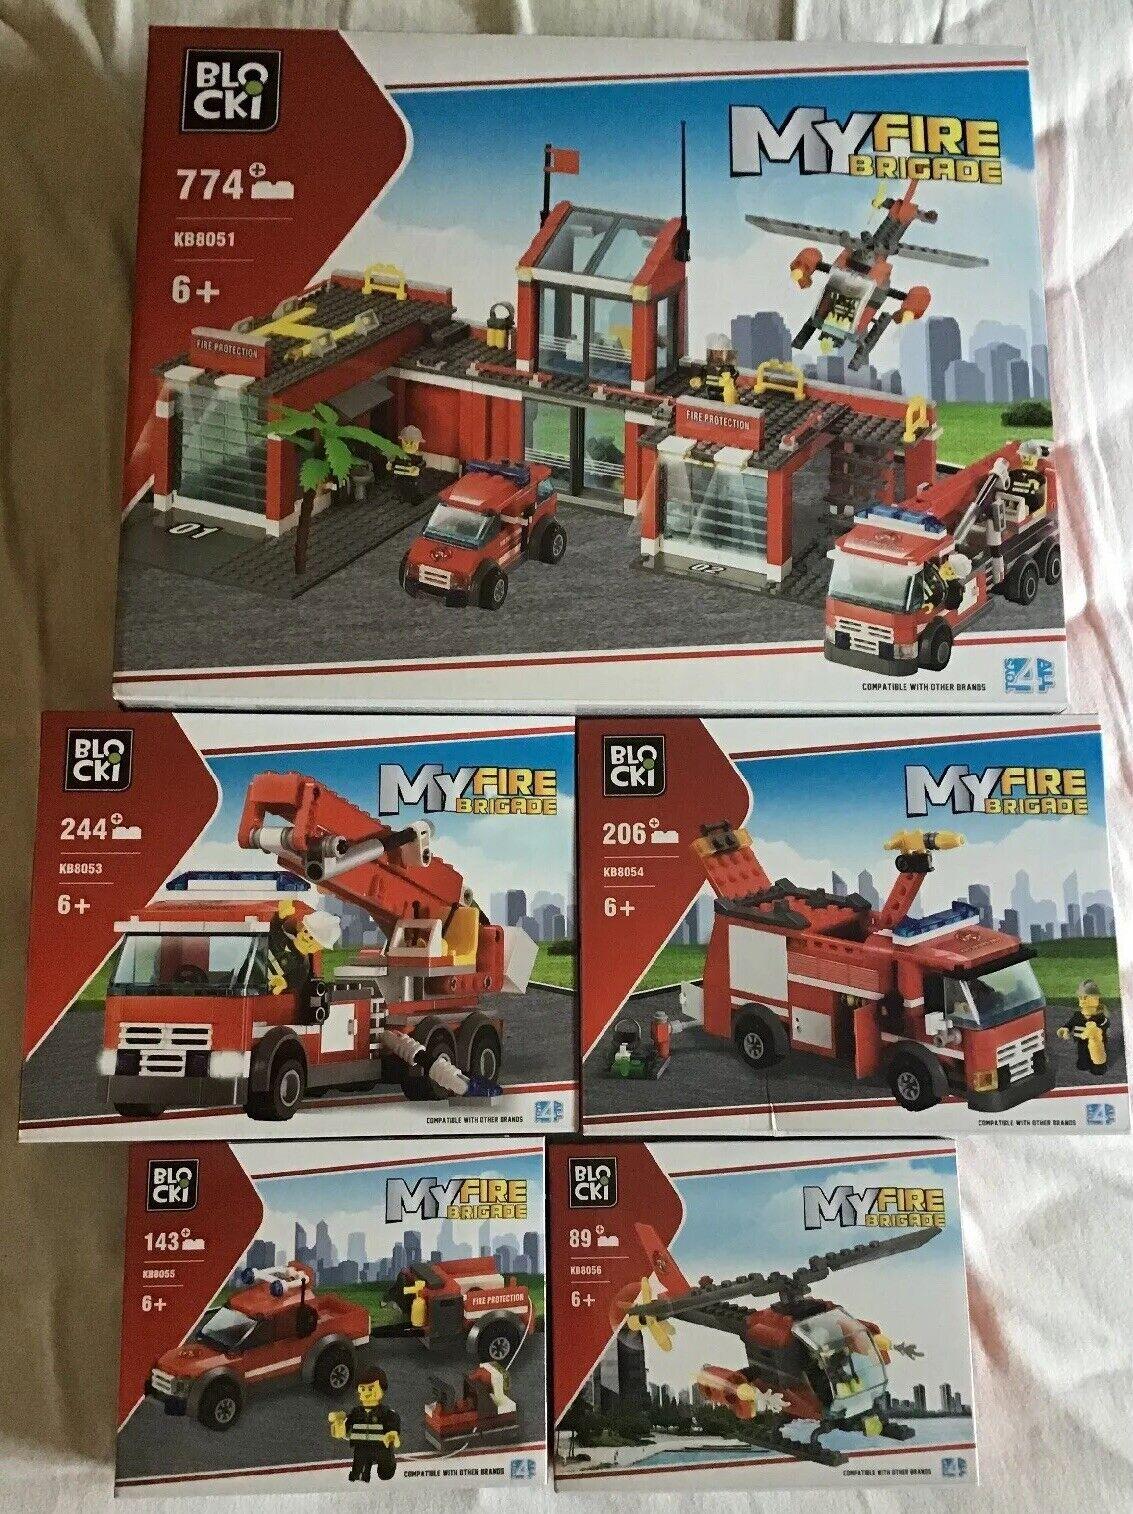 Pompiers, la casa y les V, hicules blocki compatibles con avec lego.